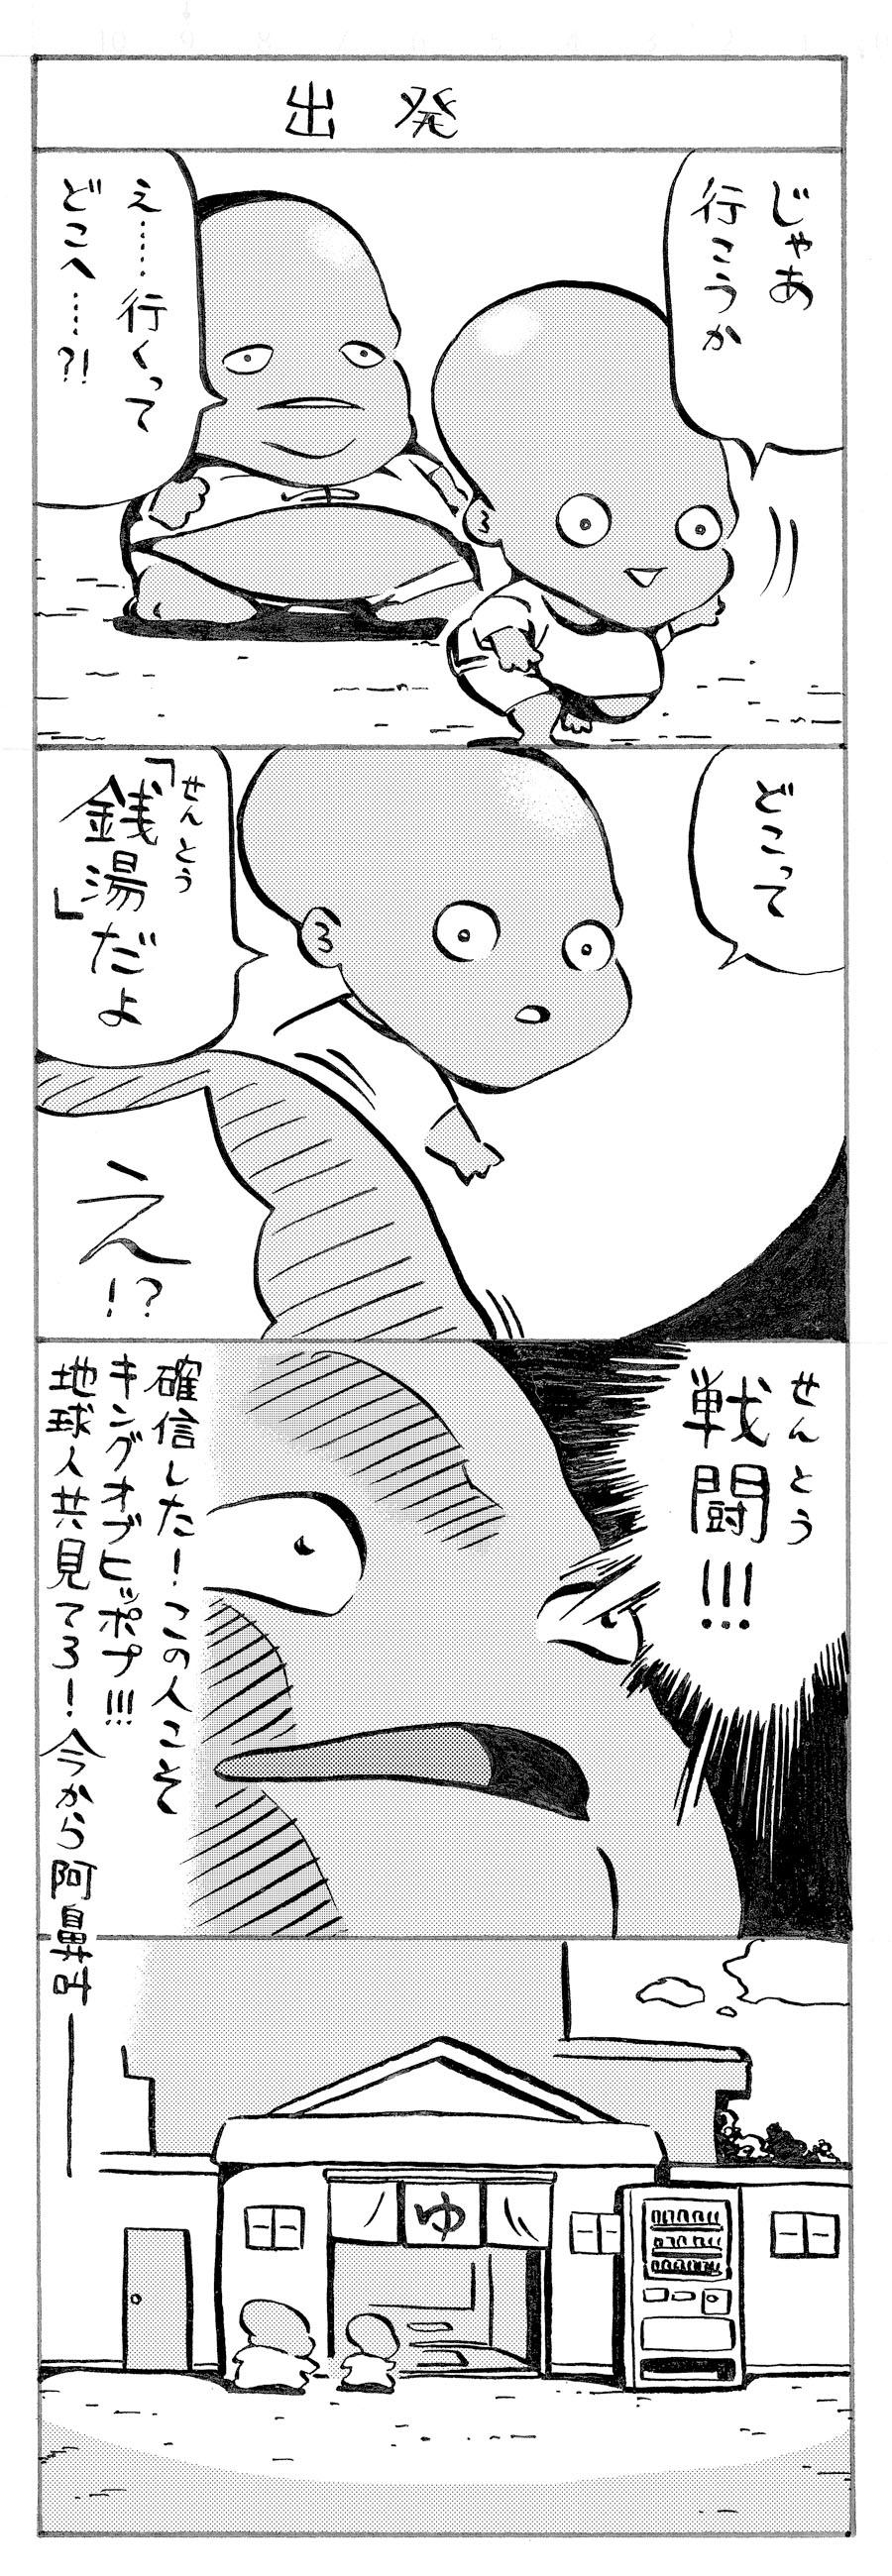 hippseijin_manga_04